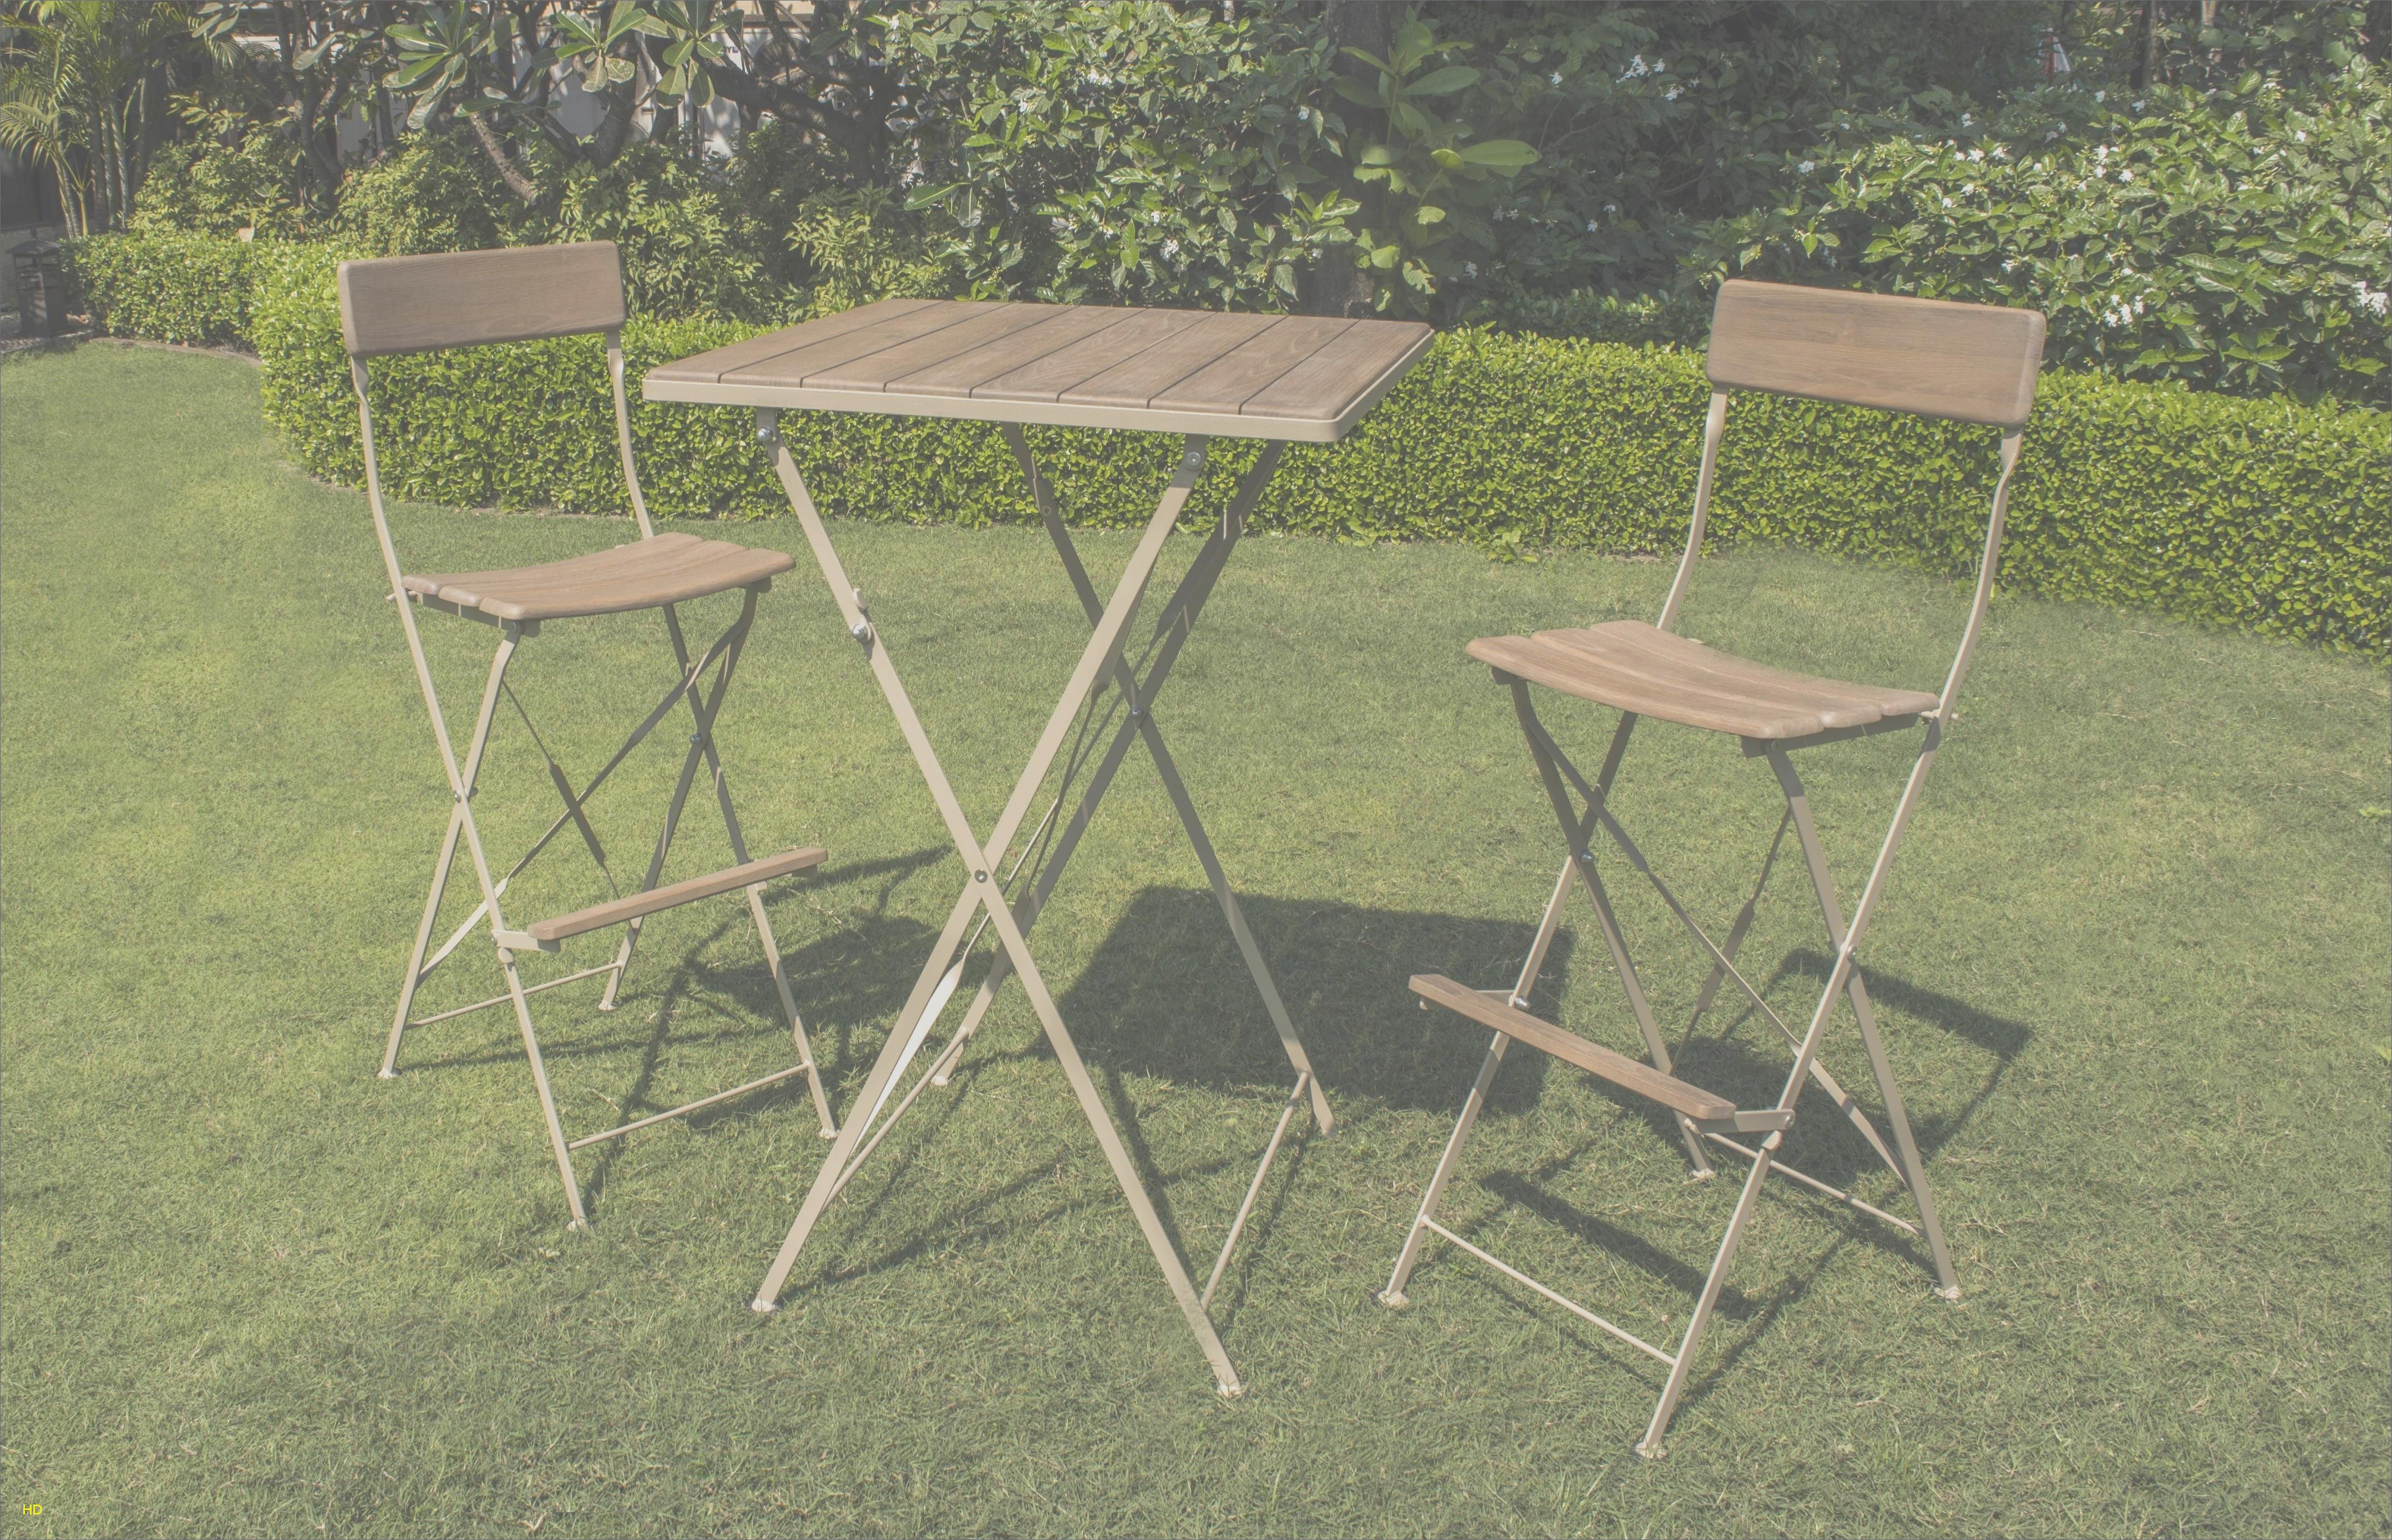 Chaise Jardin Leclerc Impressionnant Photos Table Et Chaises De Jardin Leclerc De Cool Moderne Leclerc Chaise